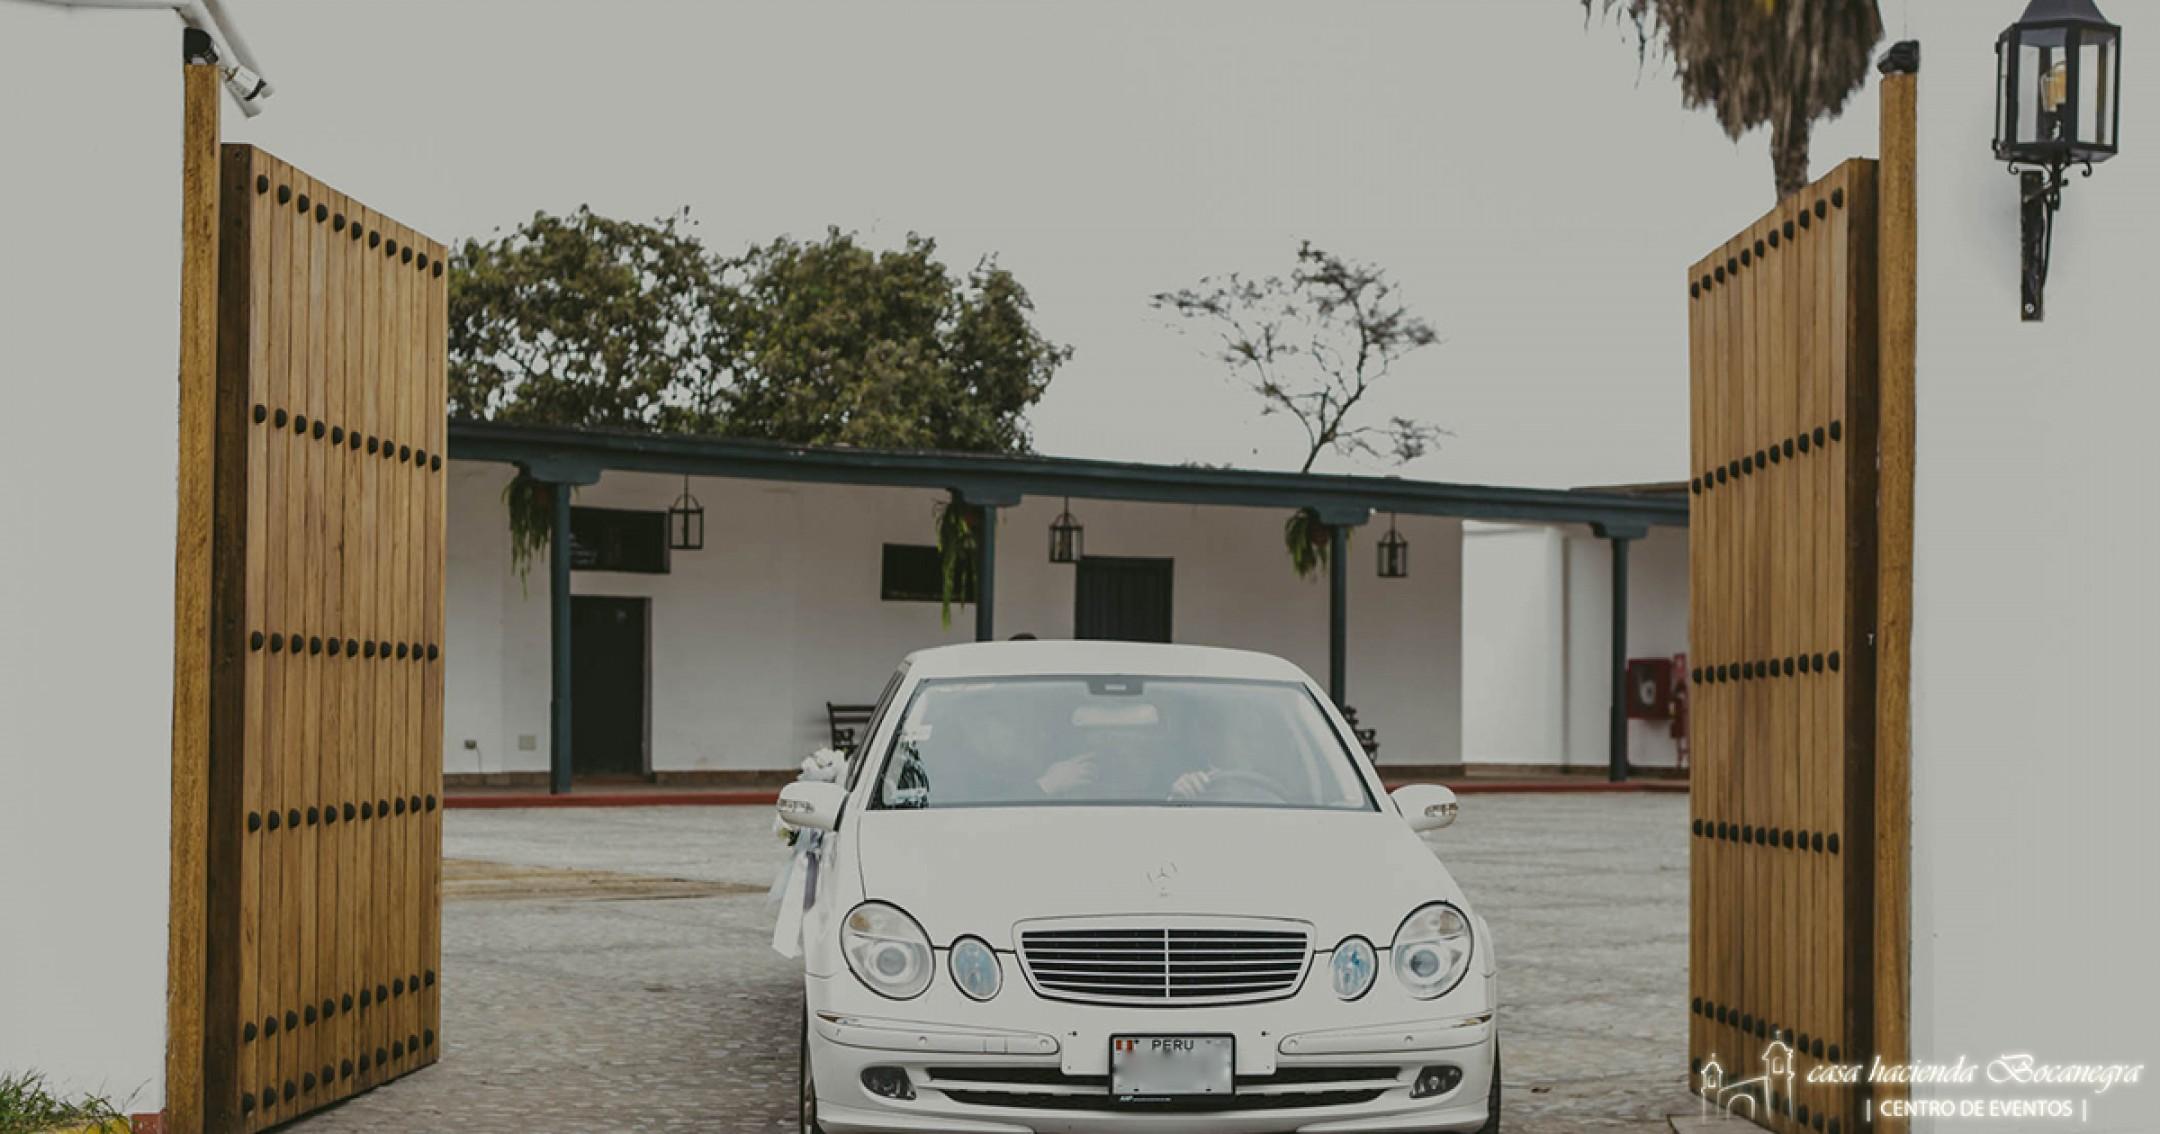 http://haciendabocanegra.com/images/chbn_jvo8Z3qpaZ_large-1080_GWL27.jpg